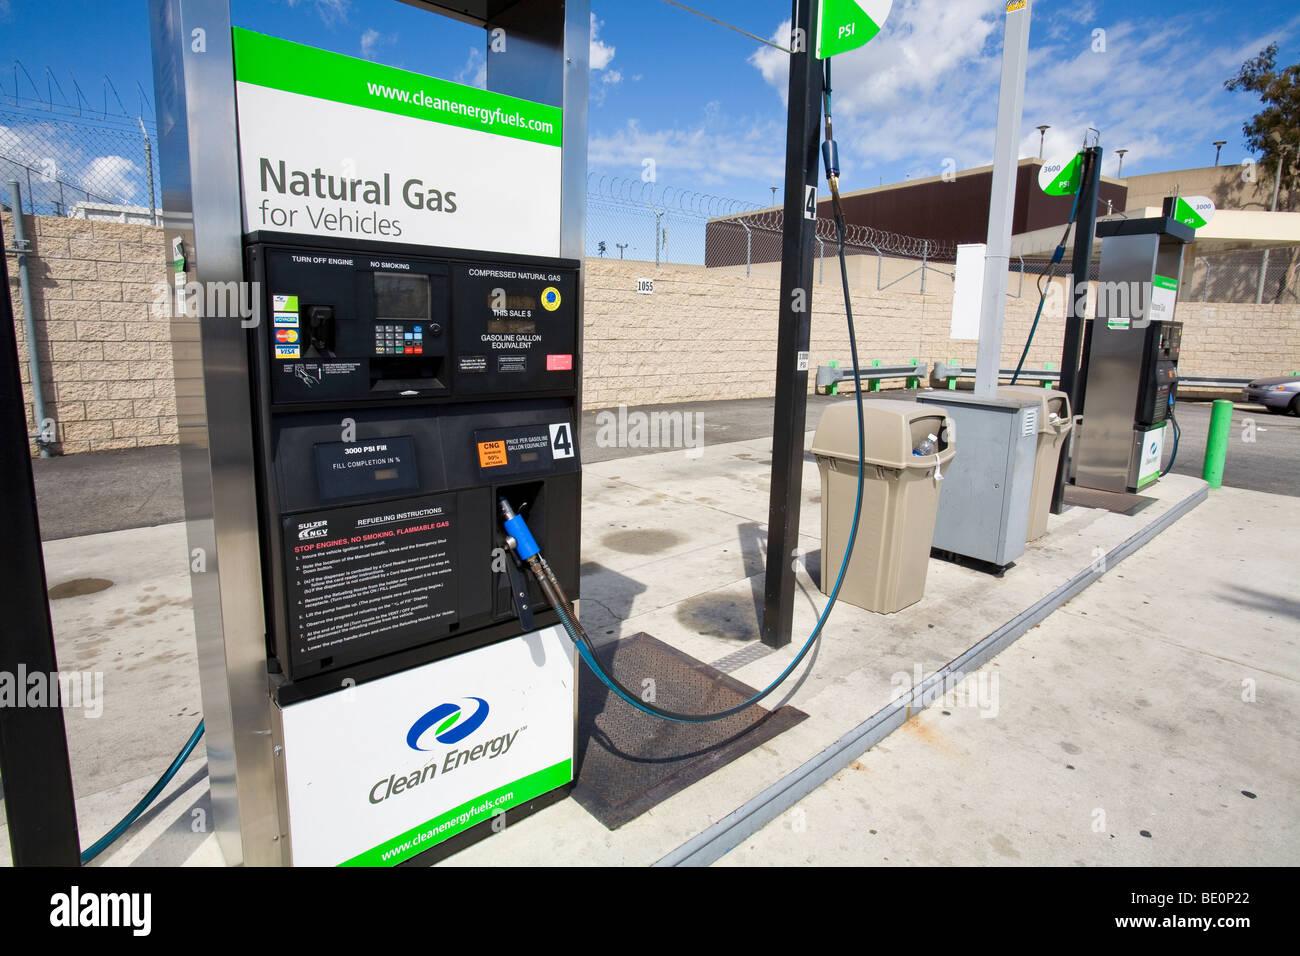 Natural Gas Stations >> Natural Gas Station Stock Photos Natural Gas Station Stock Images